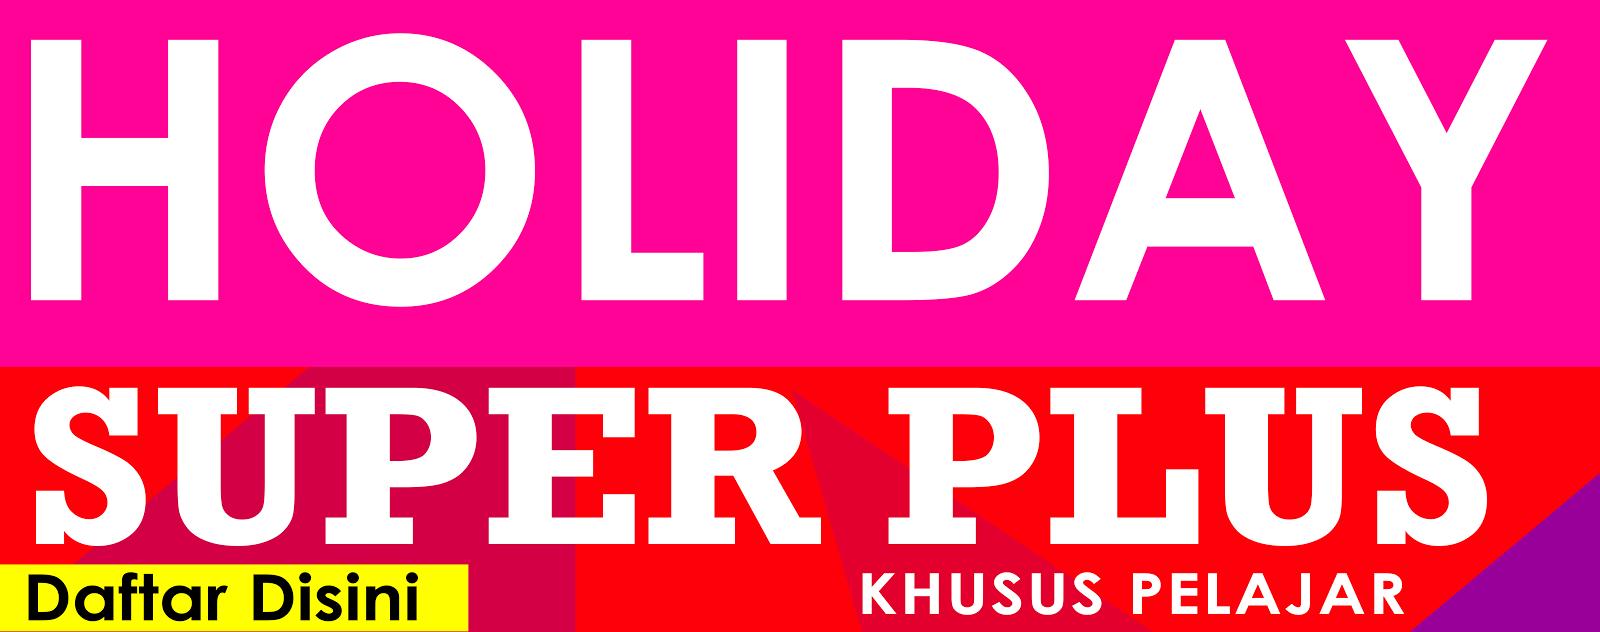 PAKET Holiday Super Plus